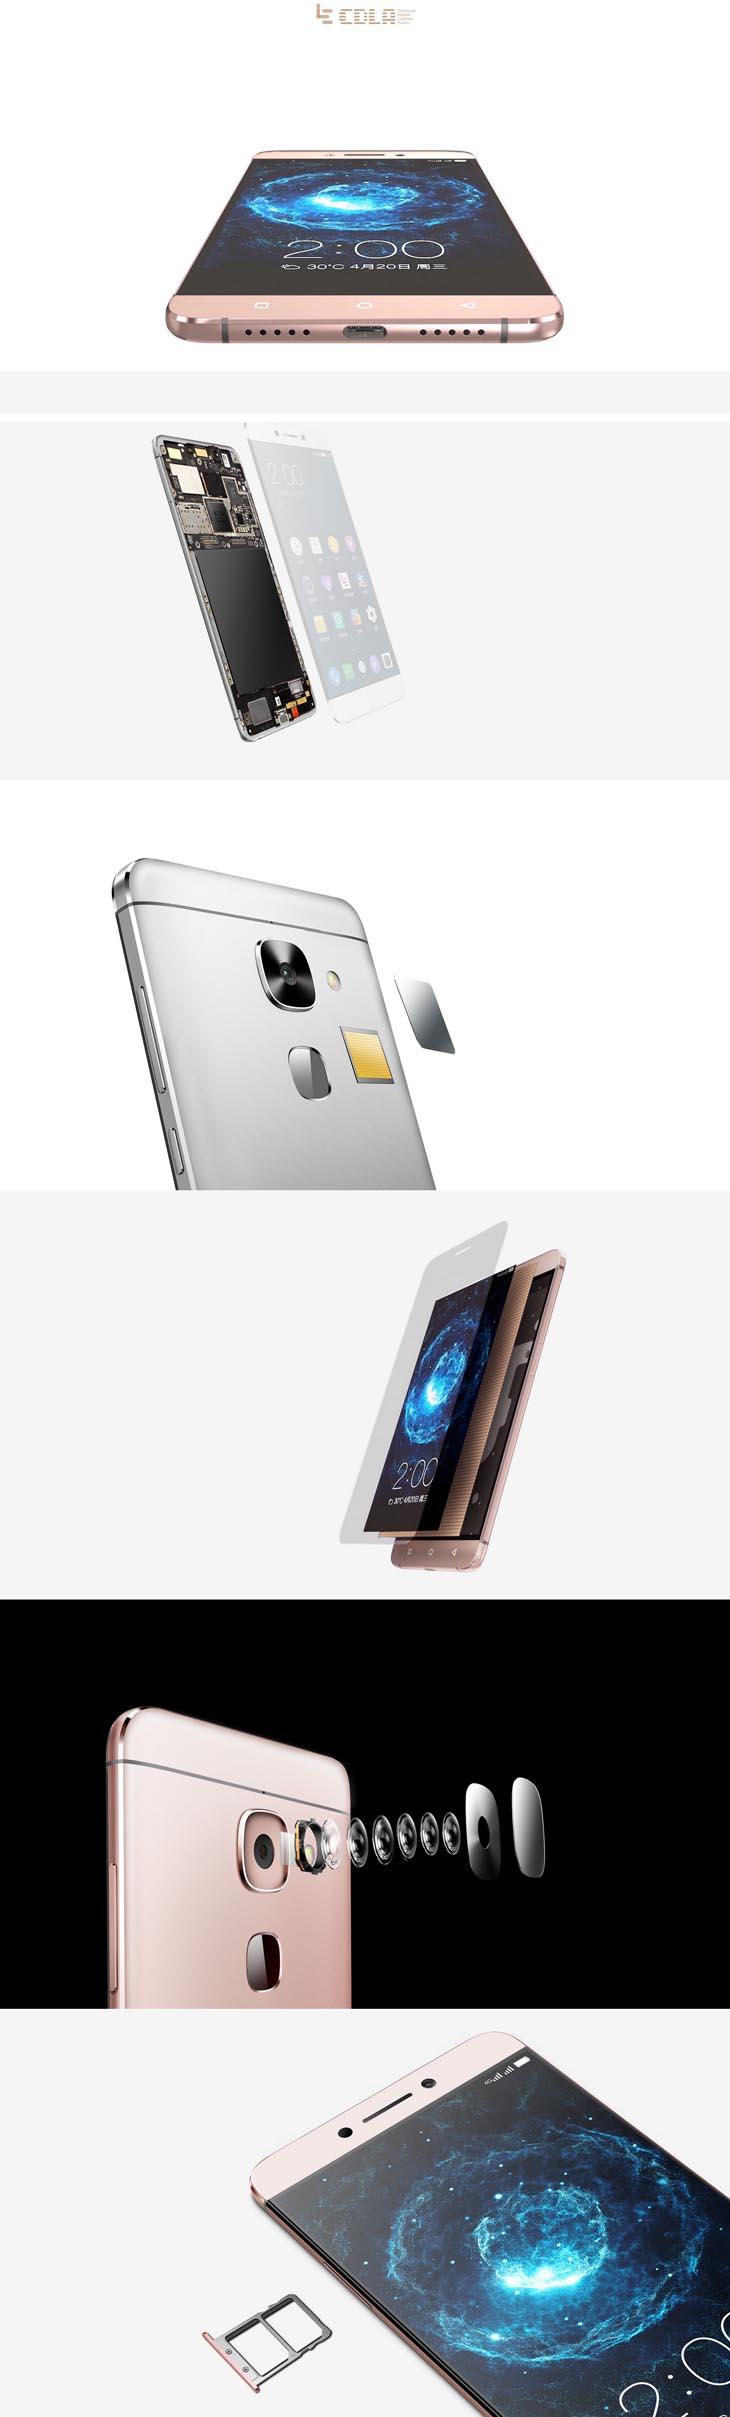 Letv Le Max 2 5 7'FHD X820 4G LTE 4GB 32GB Snapdragon820 21MP Touch ID